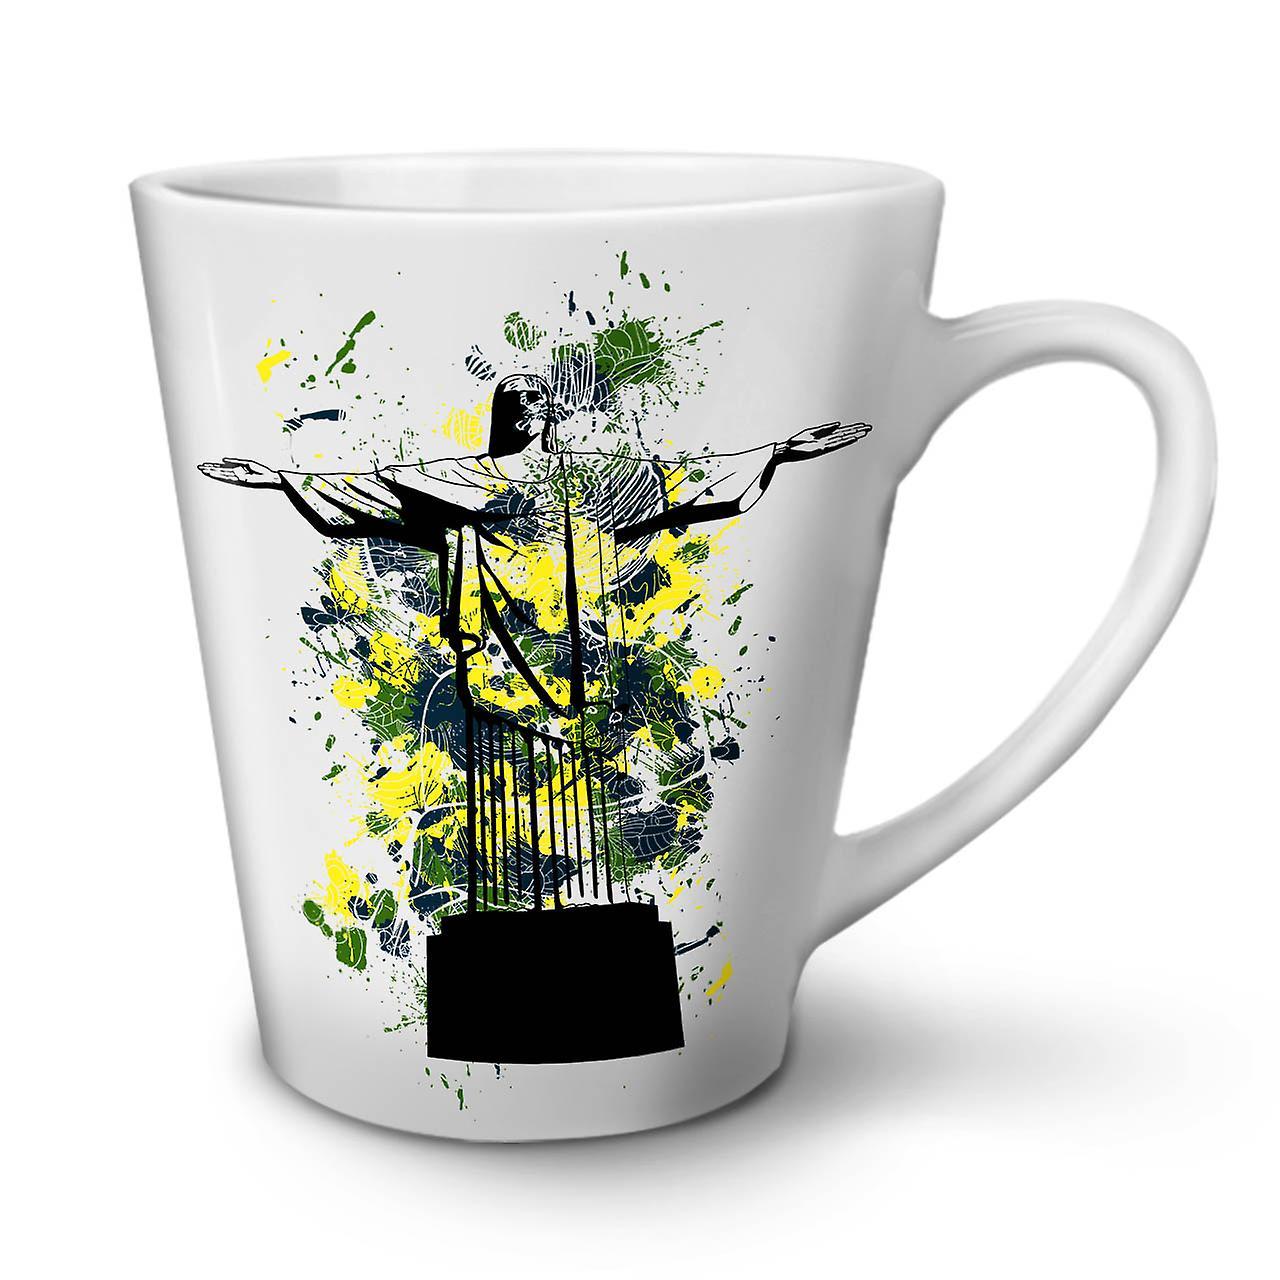 Christ Redeemer Brazil NEW White Tea Coffee Ceramic Latte Mug 12 oz   Wellcoda